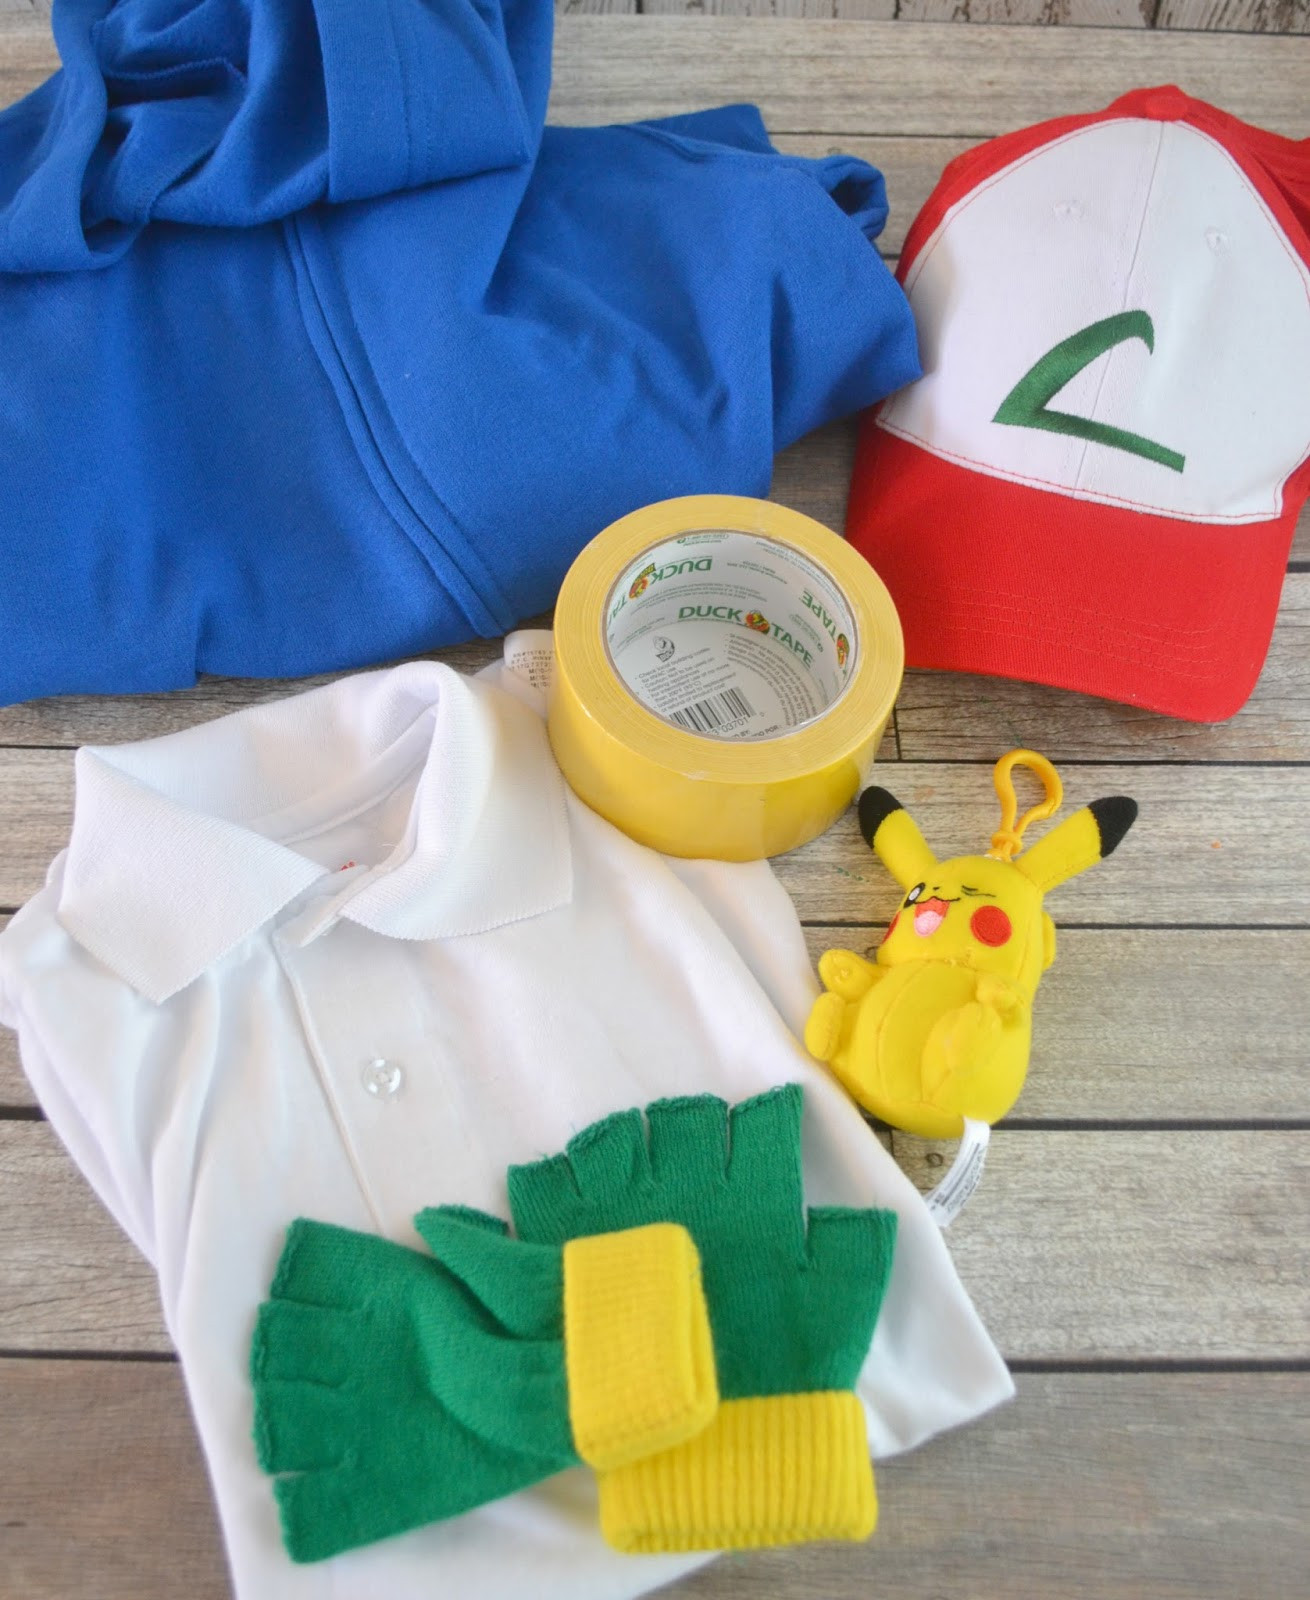 Ash Pokemon Costume DIY  Ash Ketchum Pokemon DIY Halloween Costume